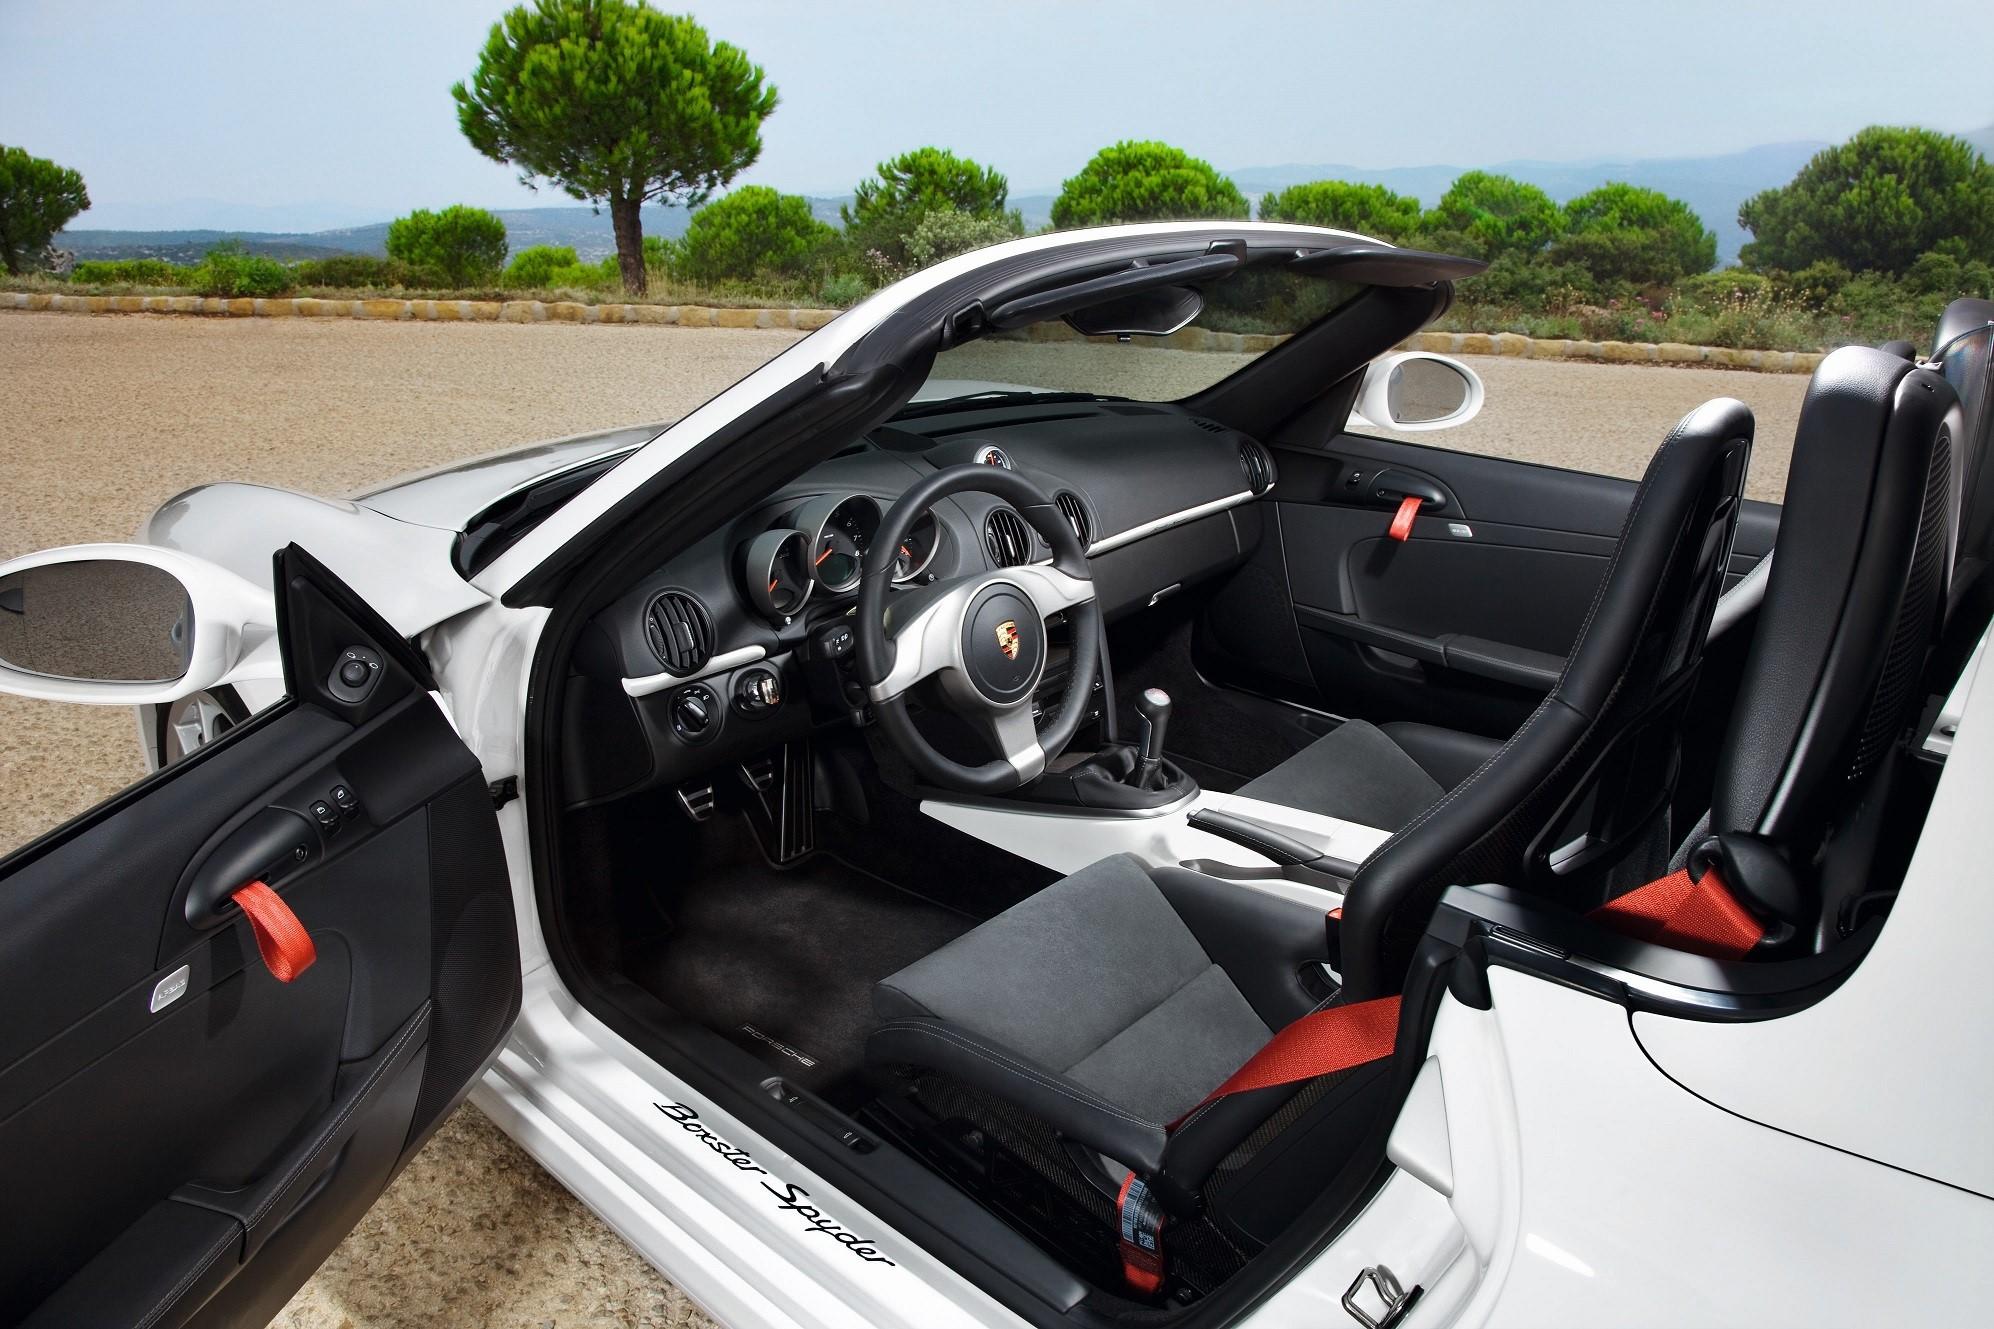 Porsche Boxster Spyder Background images